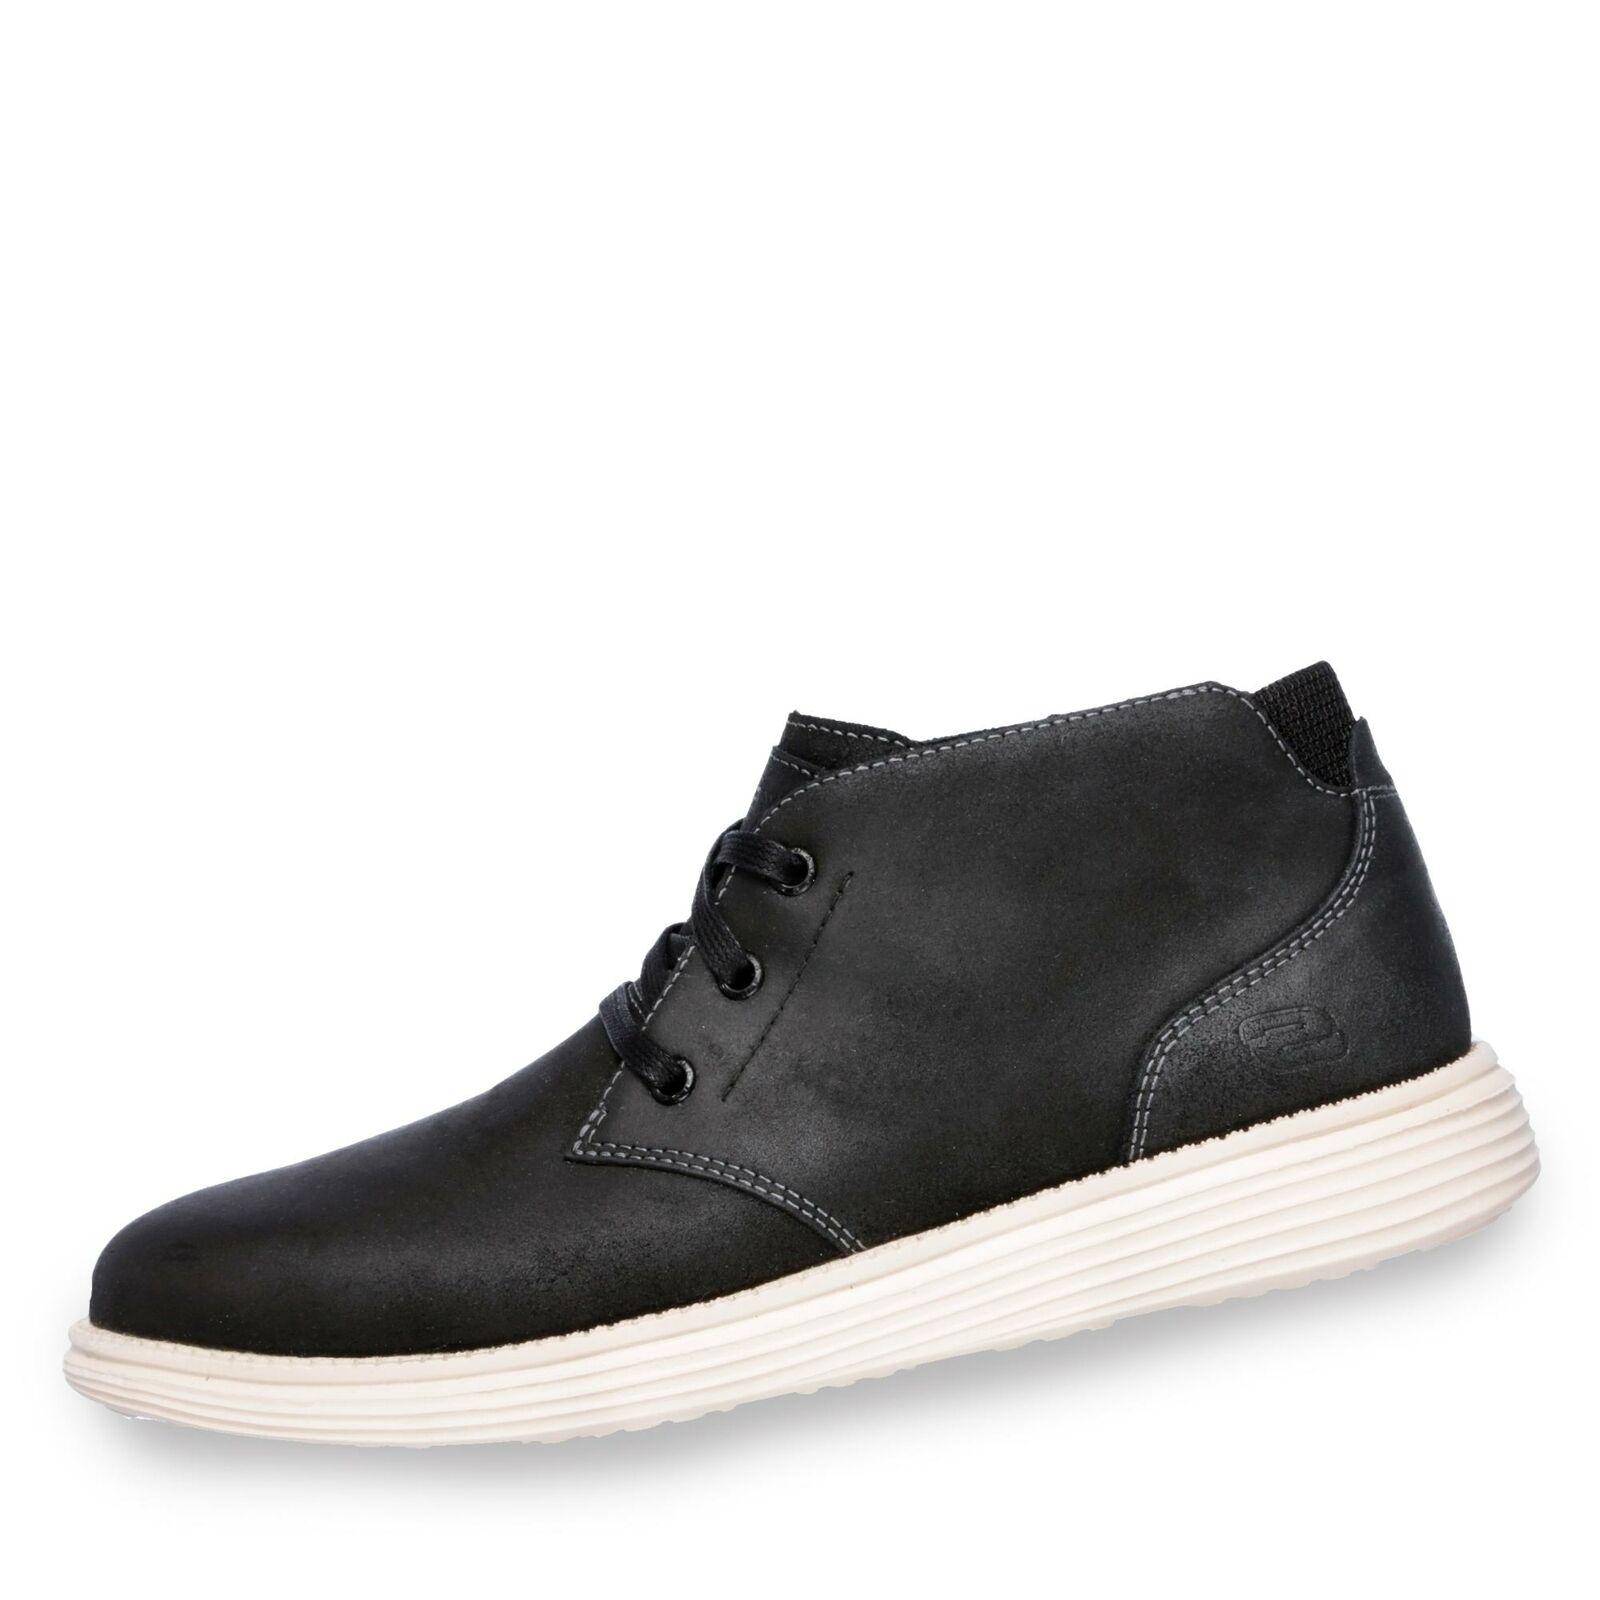 sports shoes b890b ac7e8 Rolano - Status Skechers Turnschuhe Herren schwarz Schuhe ...